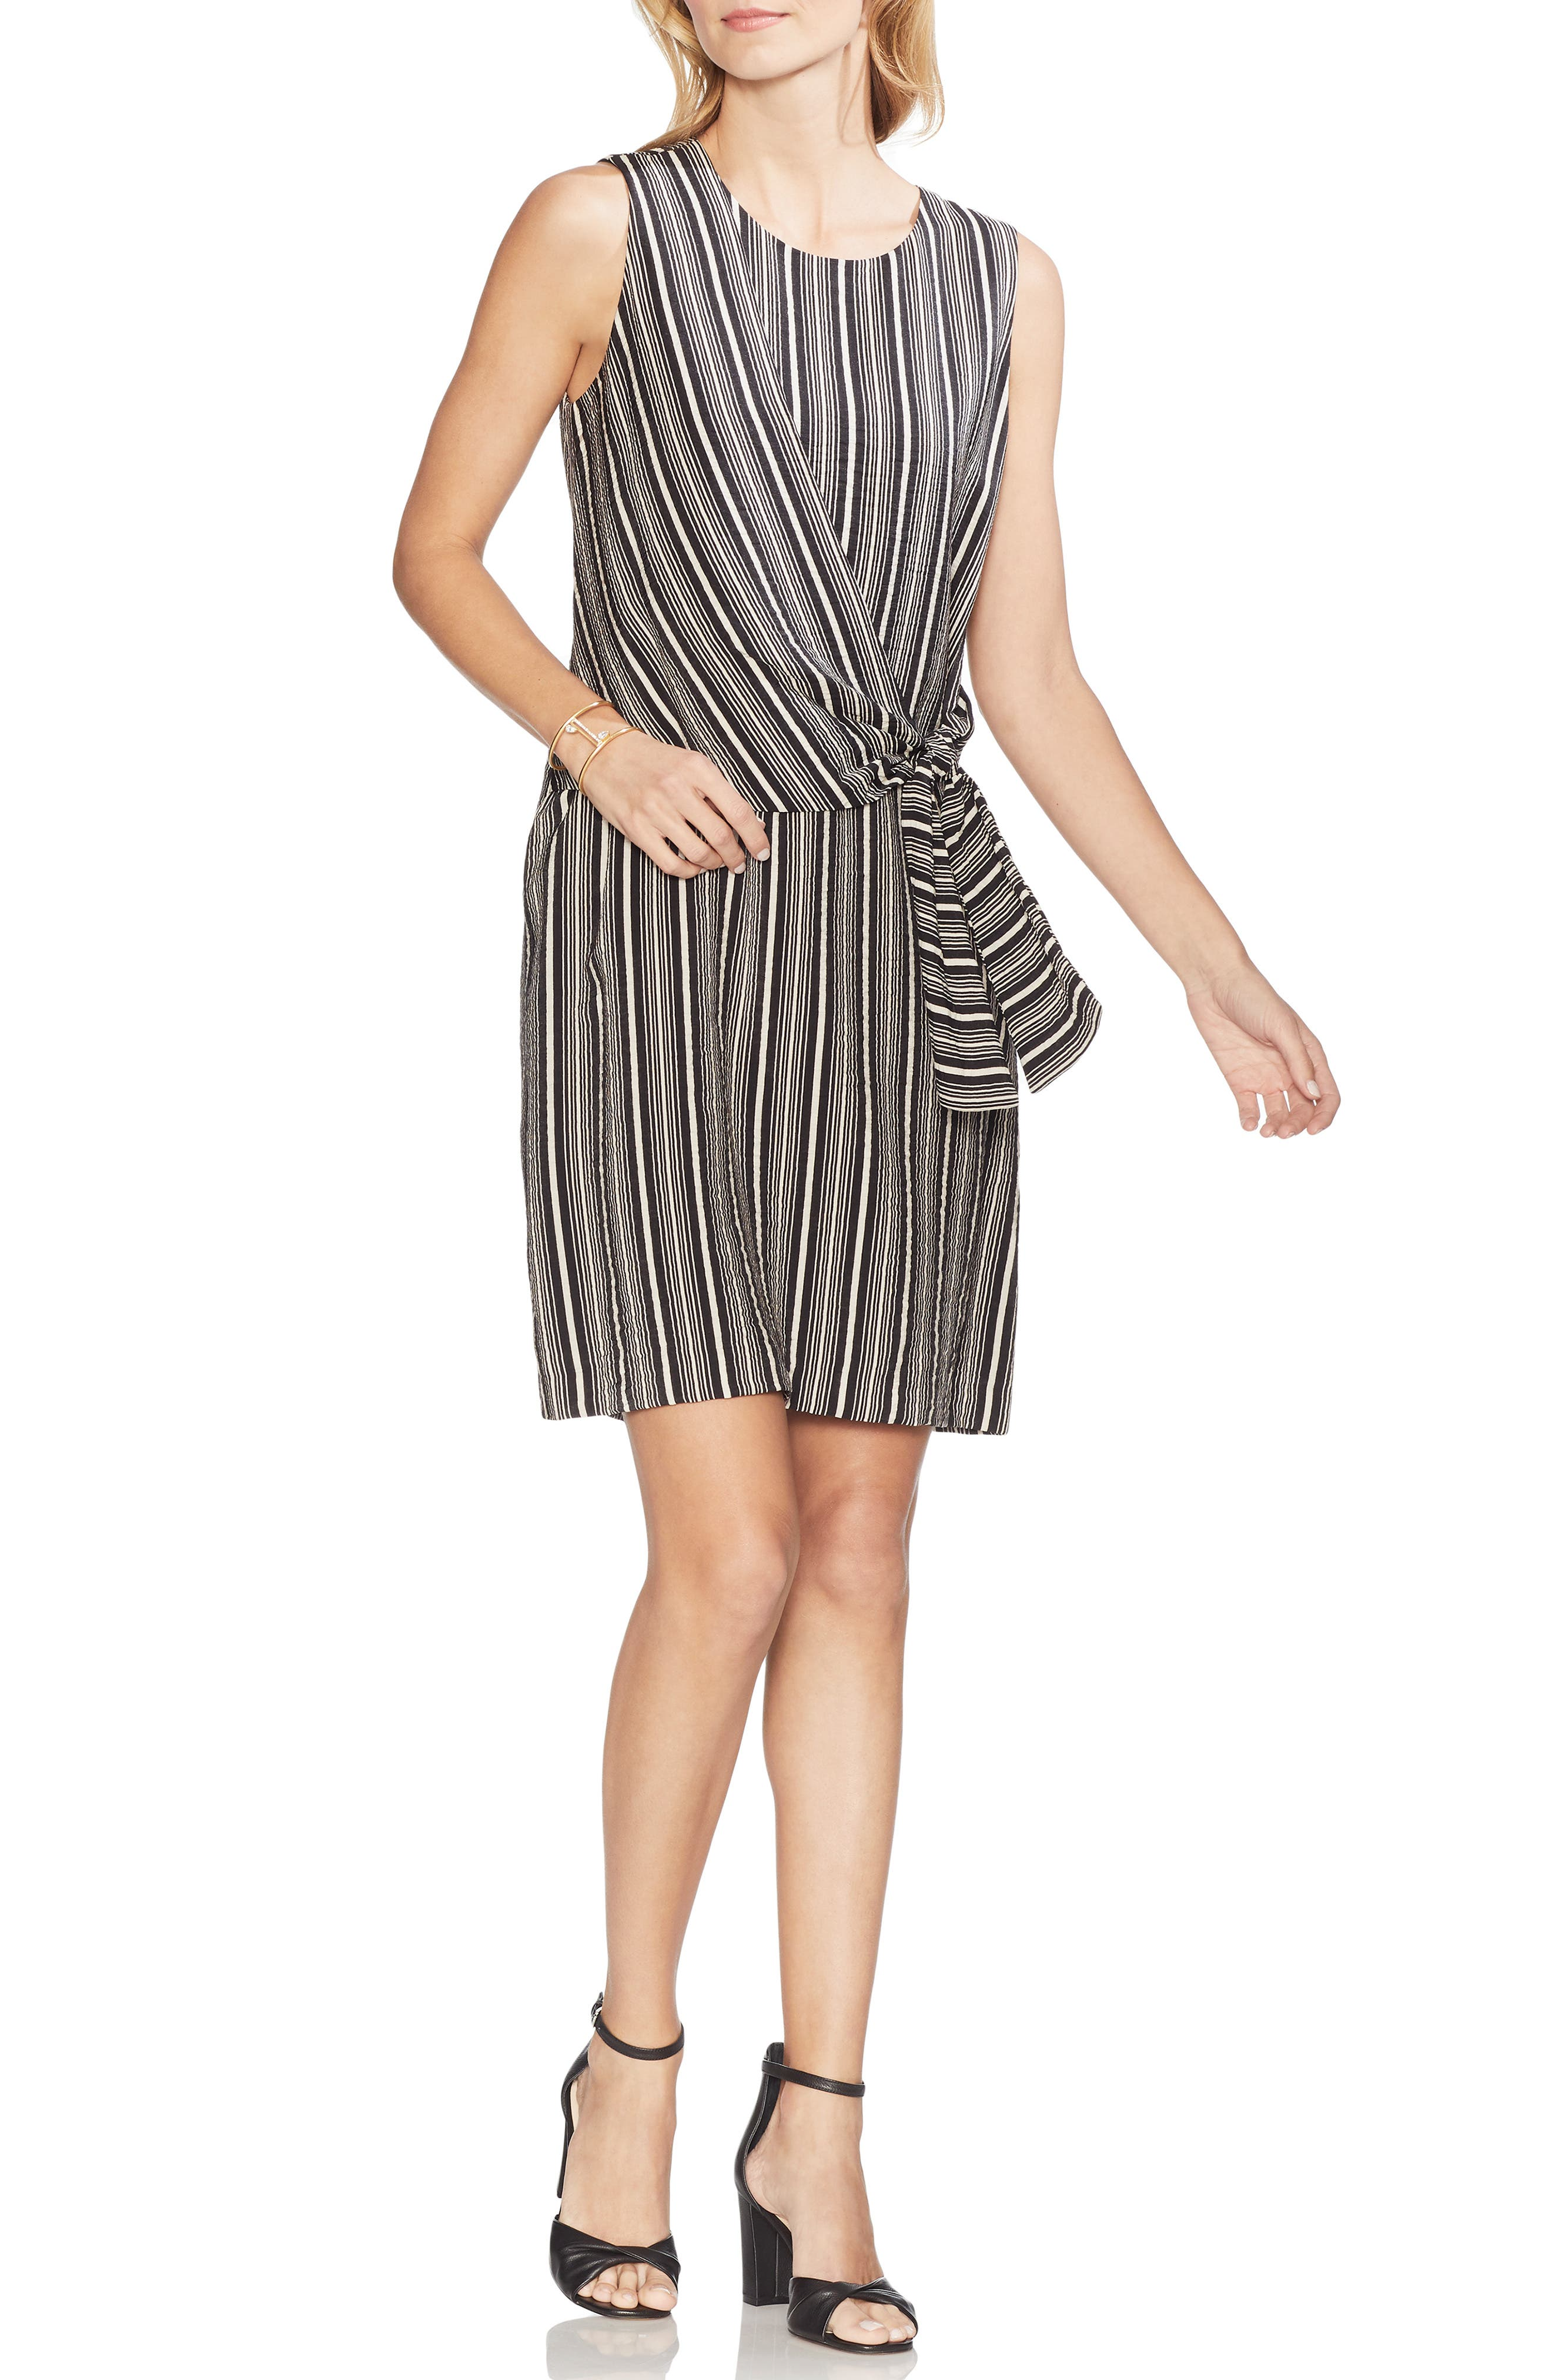 Vince Camuto Desert Stripe Tie Front Asymmetrical Shift Dress, Black